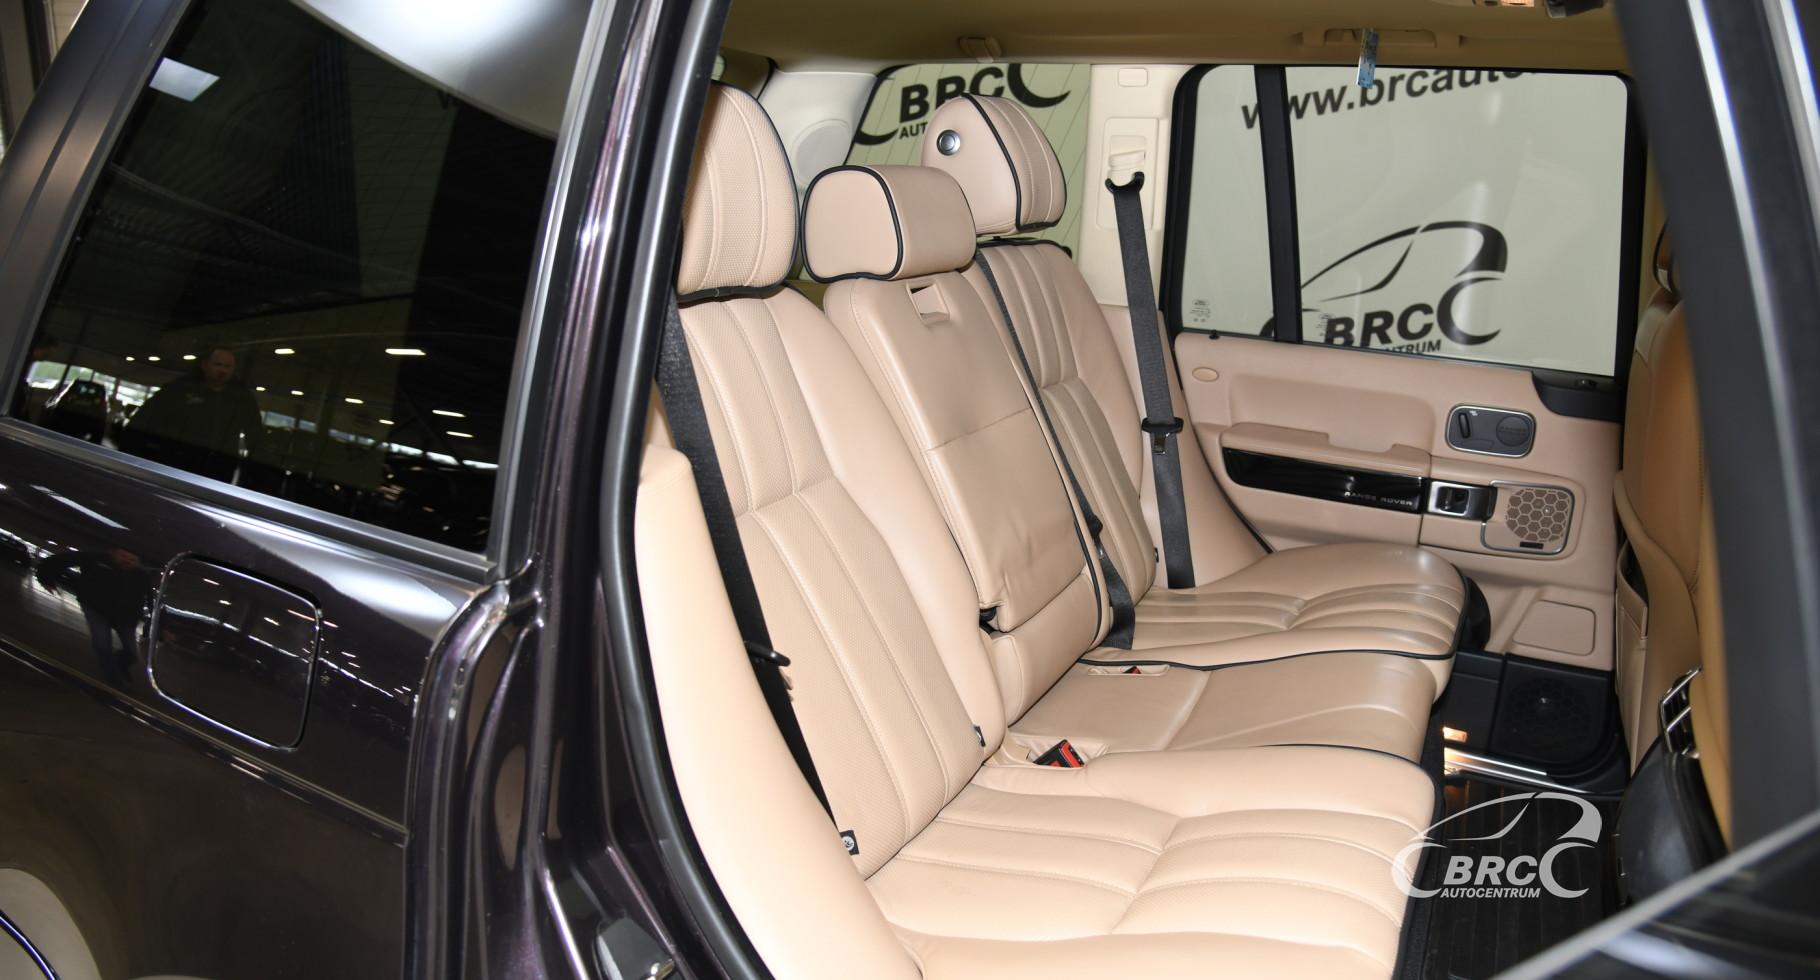 Land-Rover Range Rover 4.4 TDV8 Vogue